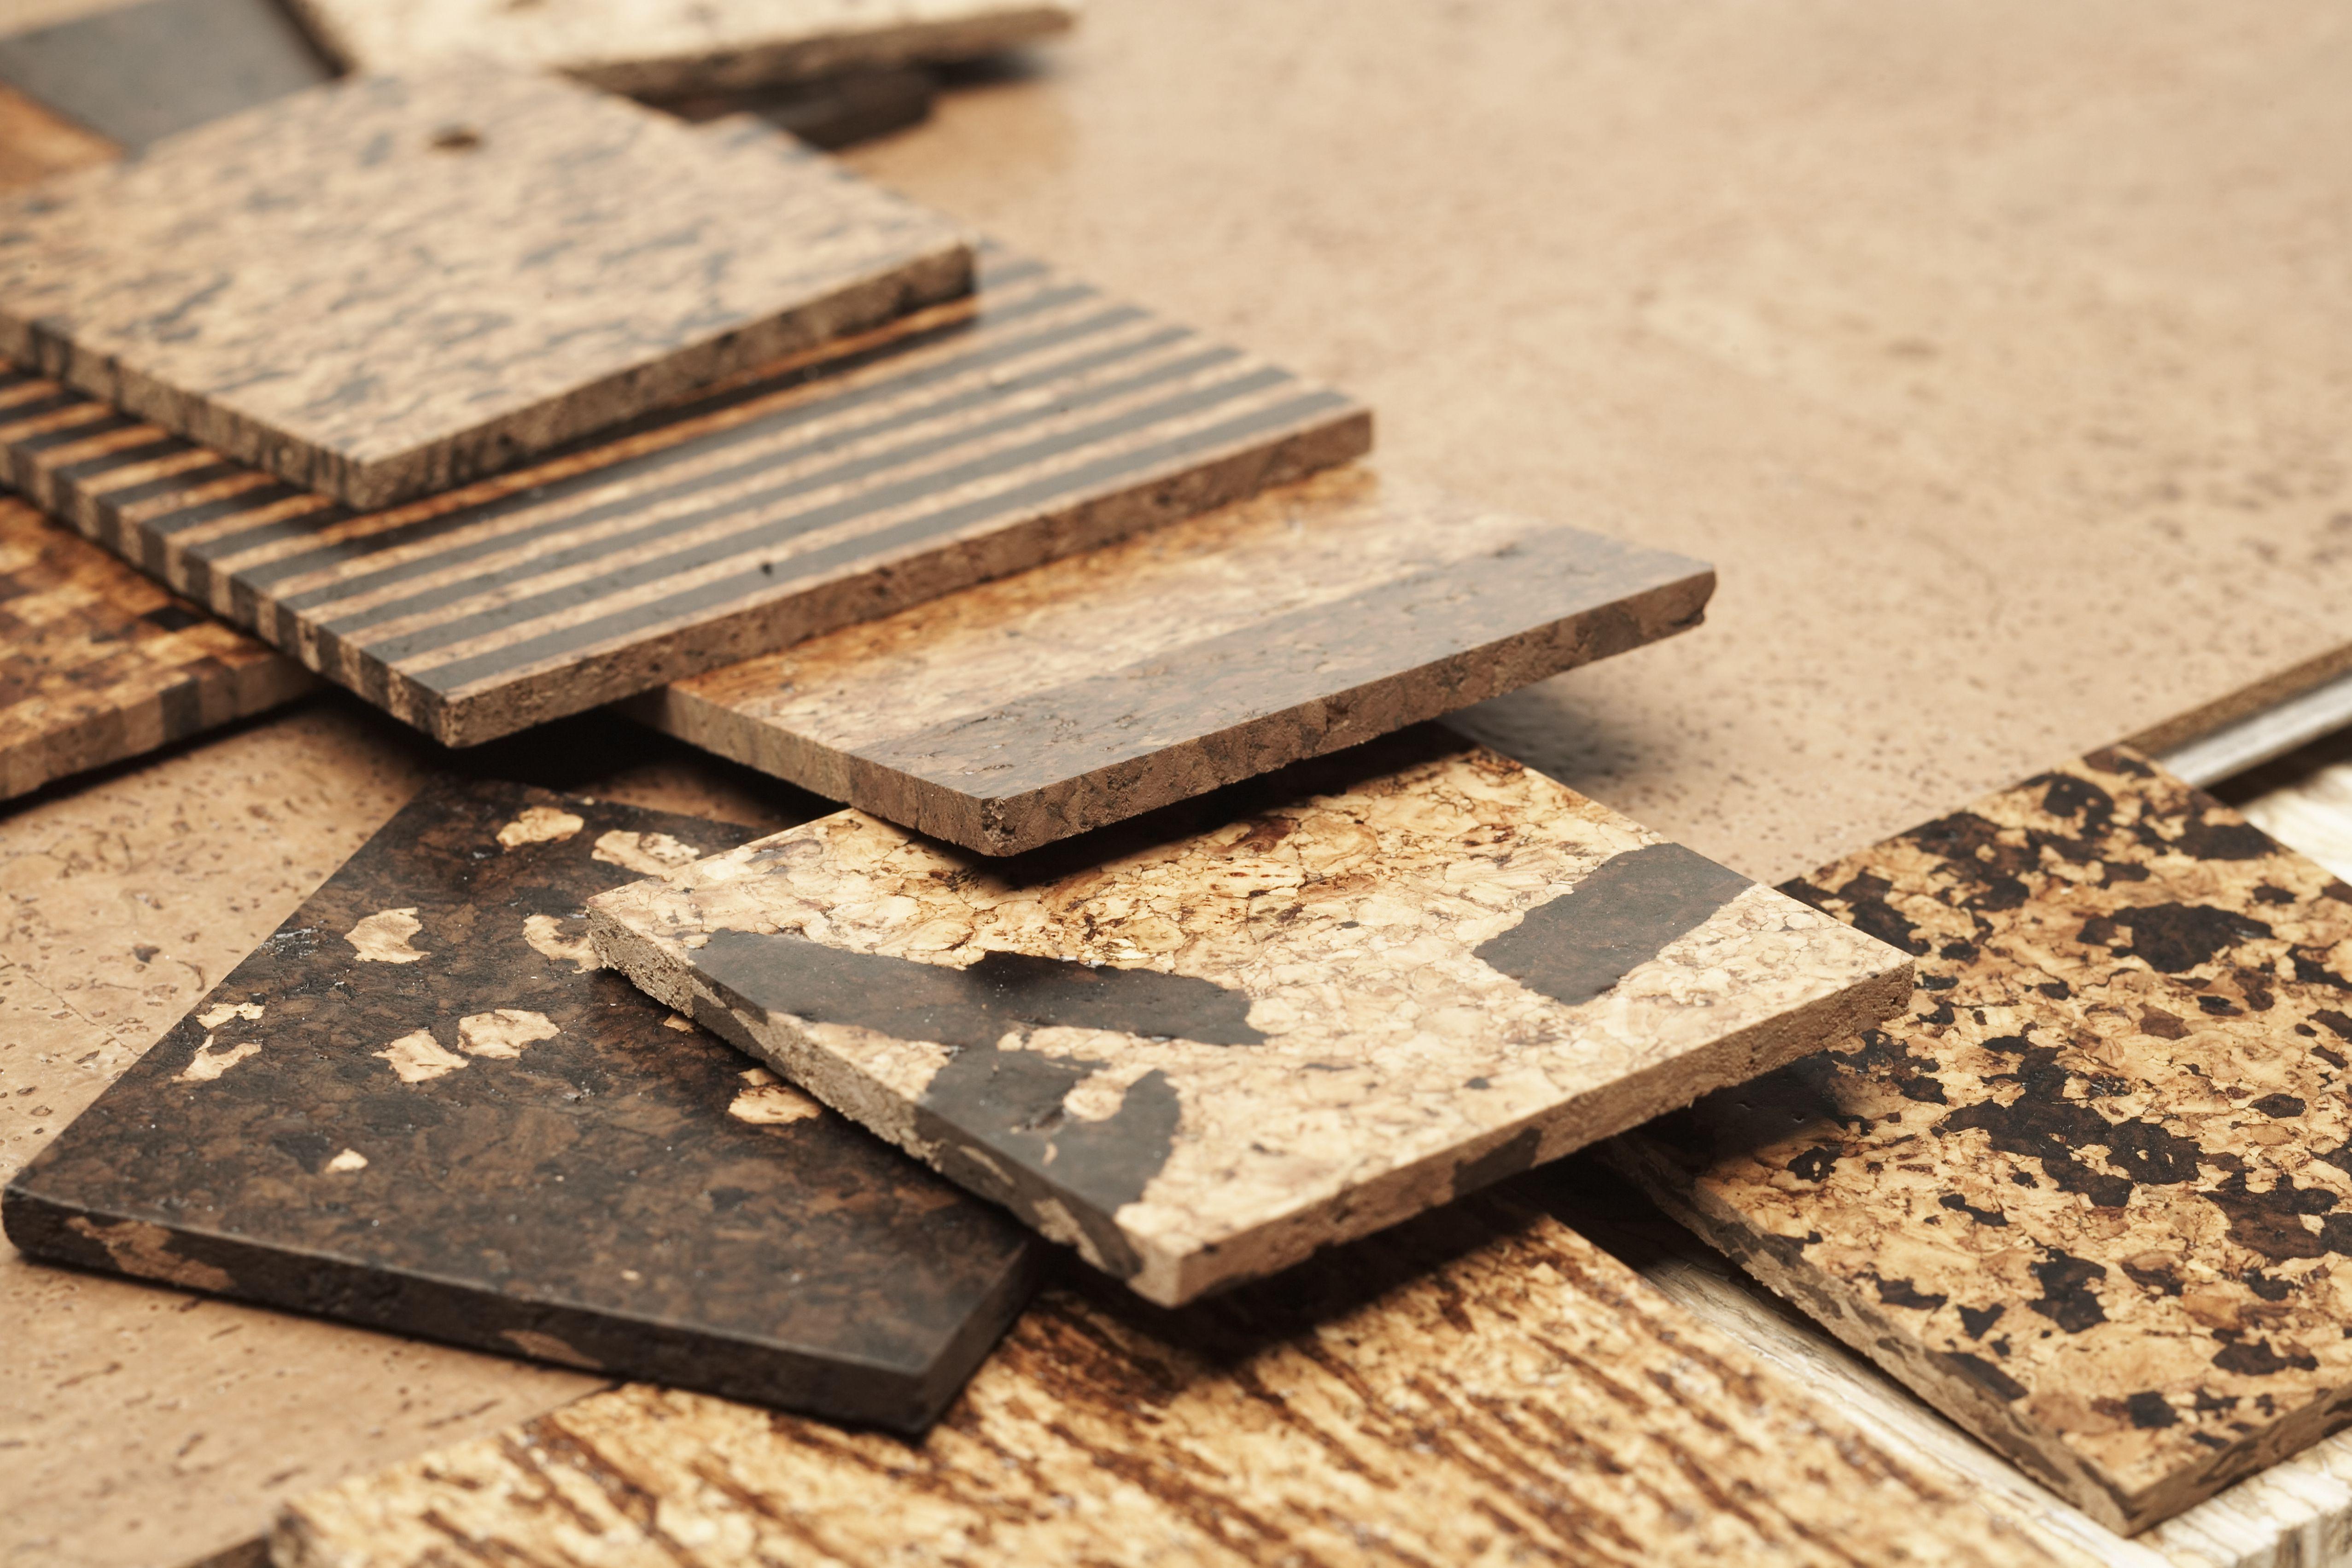 cork flooring cost vs hardwood of using cork floor tiles in your kitchen inside assorted cork tiles elevated view 200544917 001 5849d2215f9b58a8cdcf1344